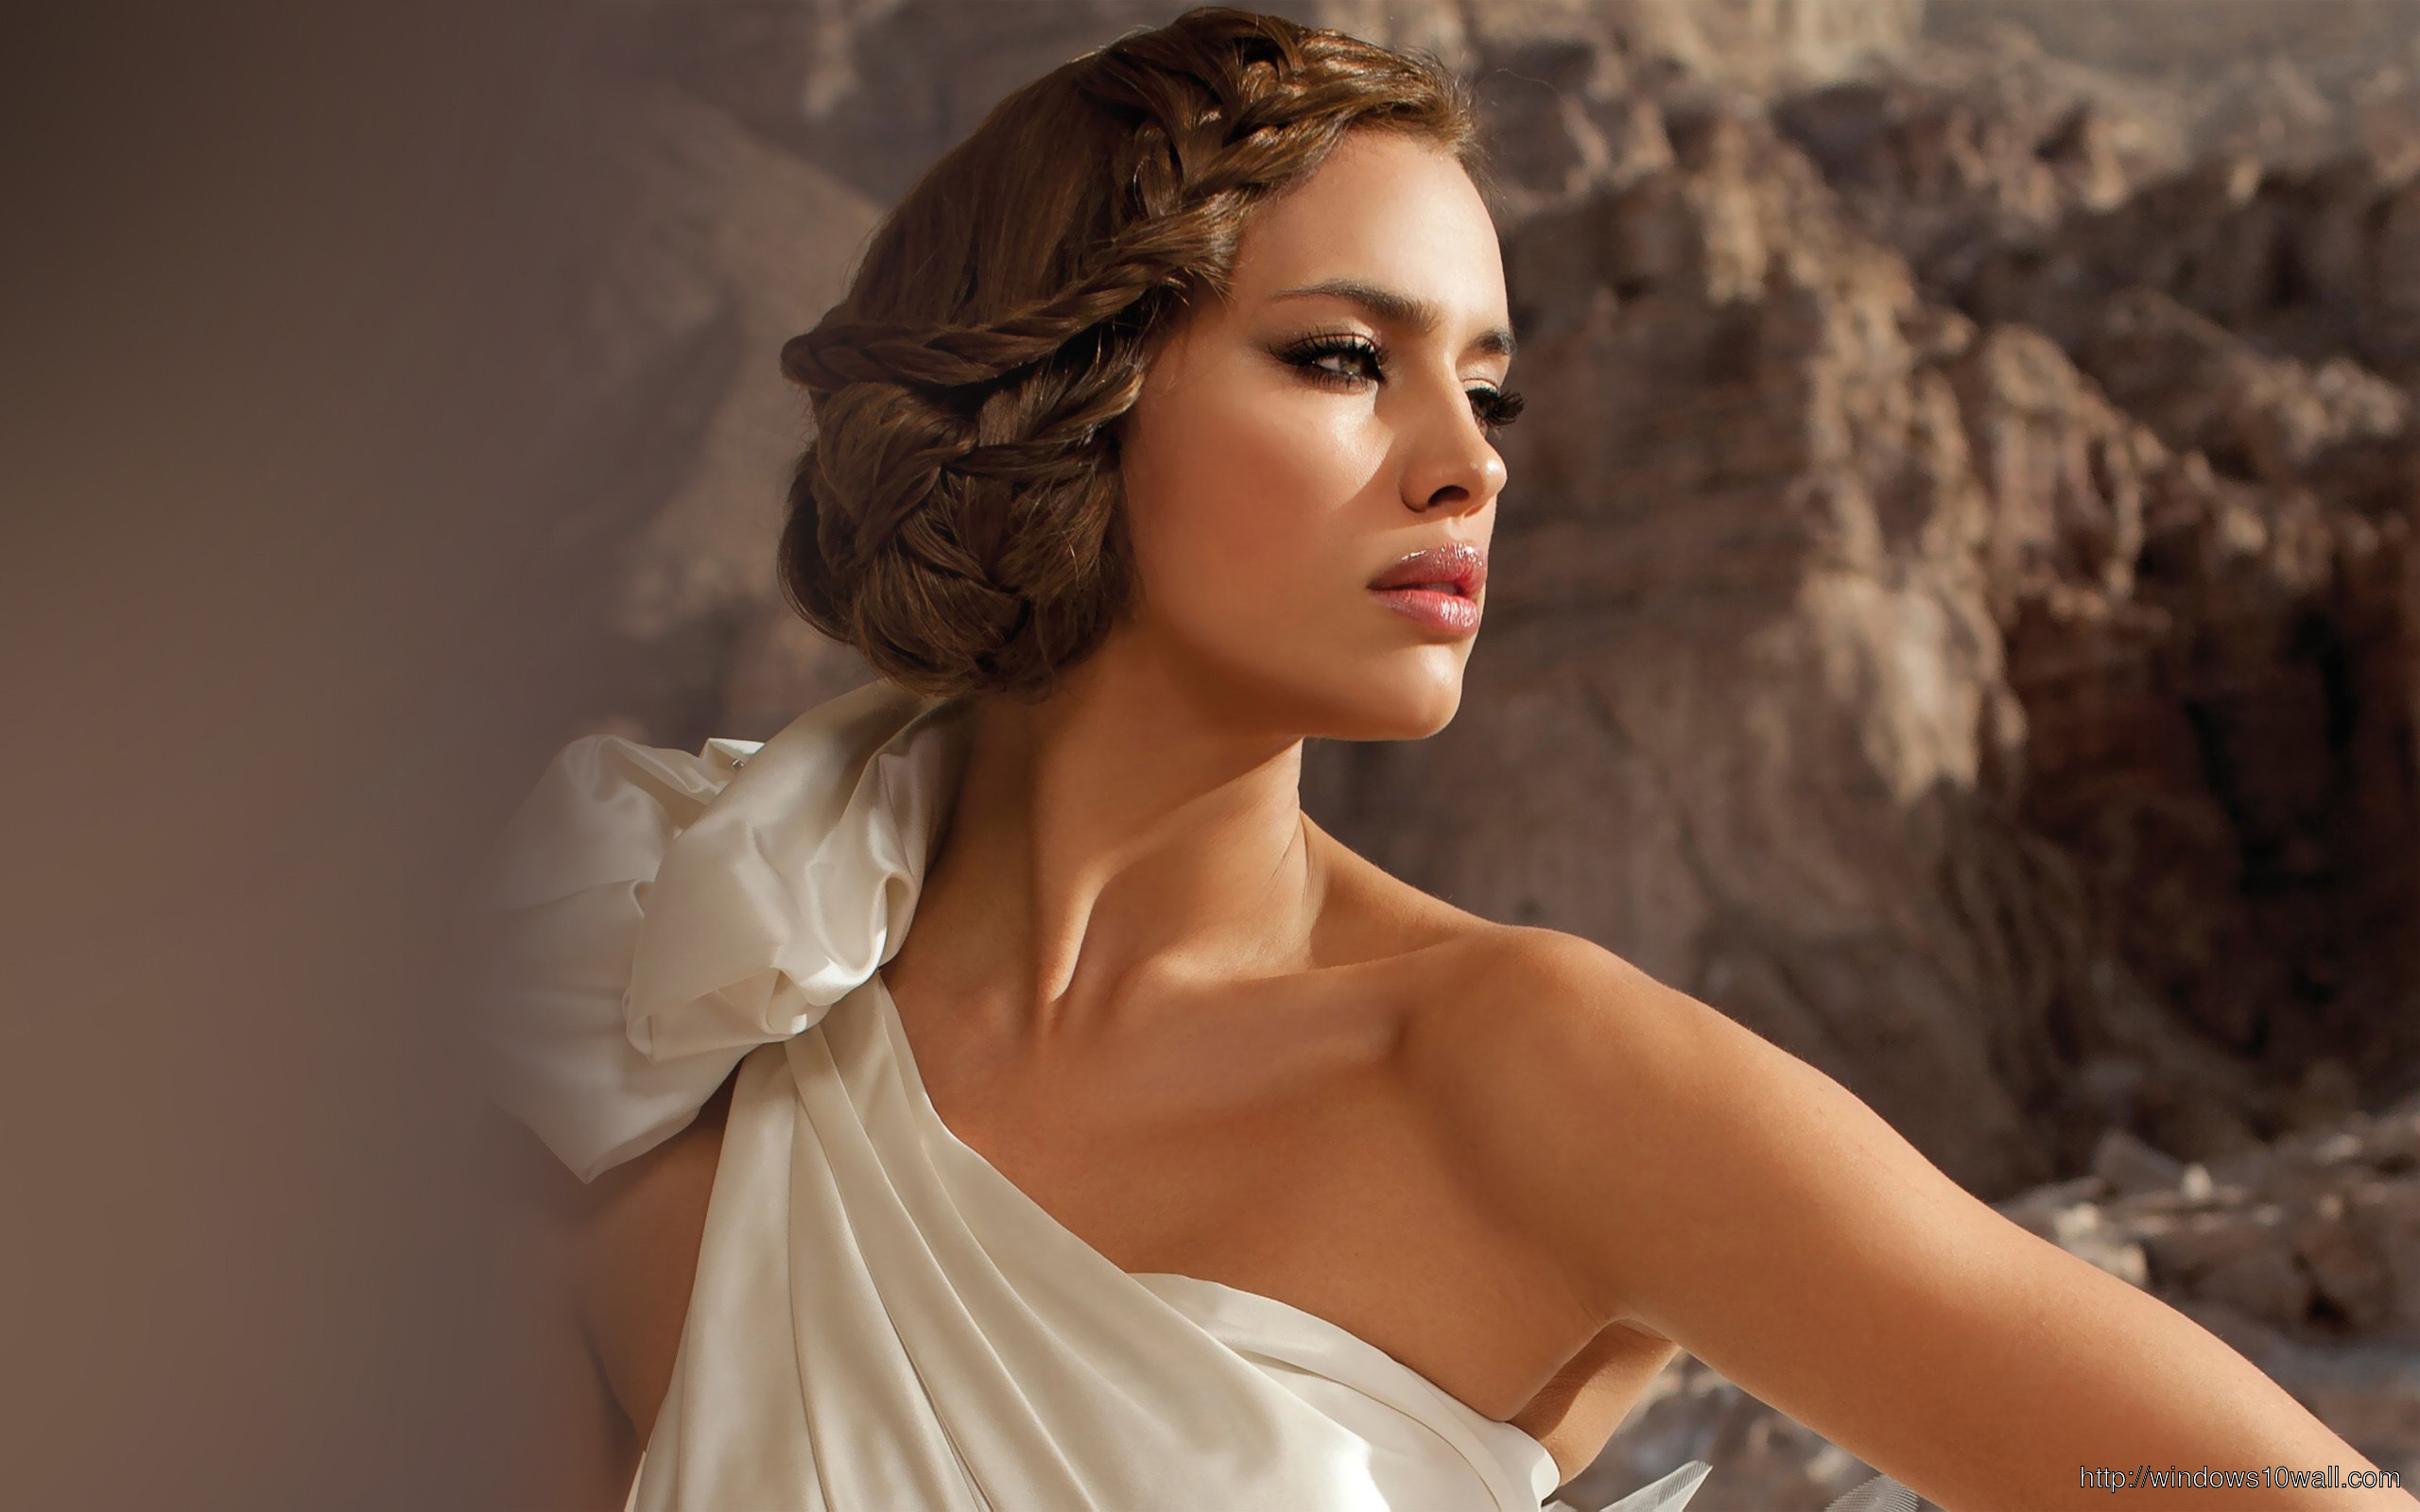 Irina Shayk White Outfit Wallpaper